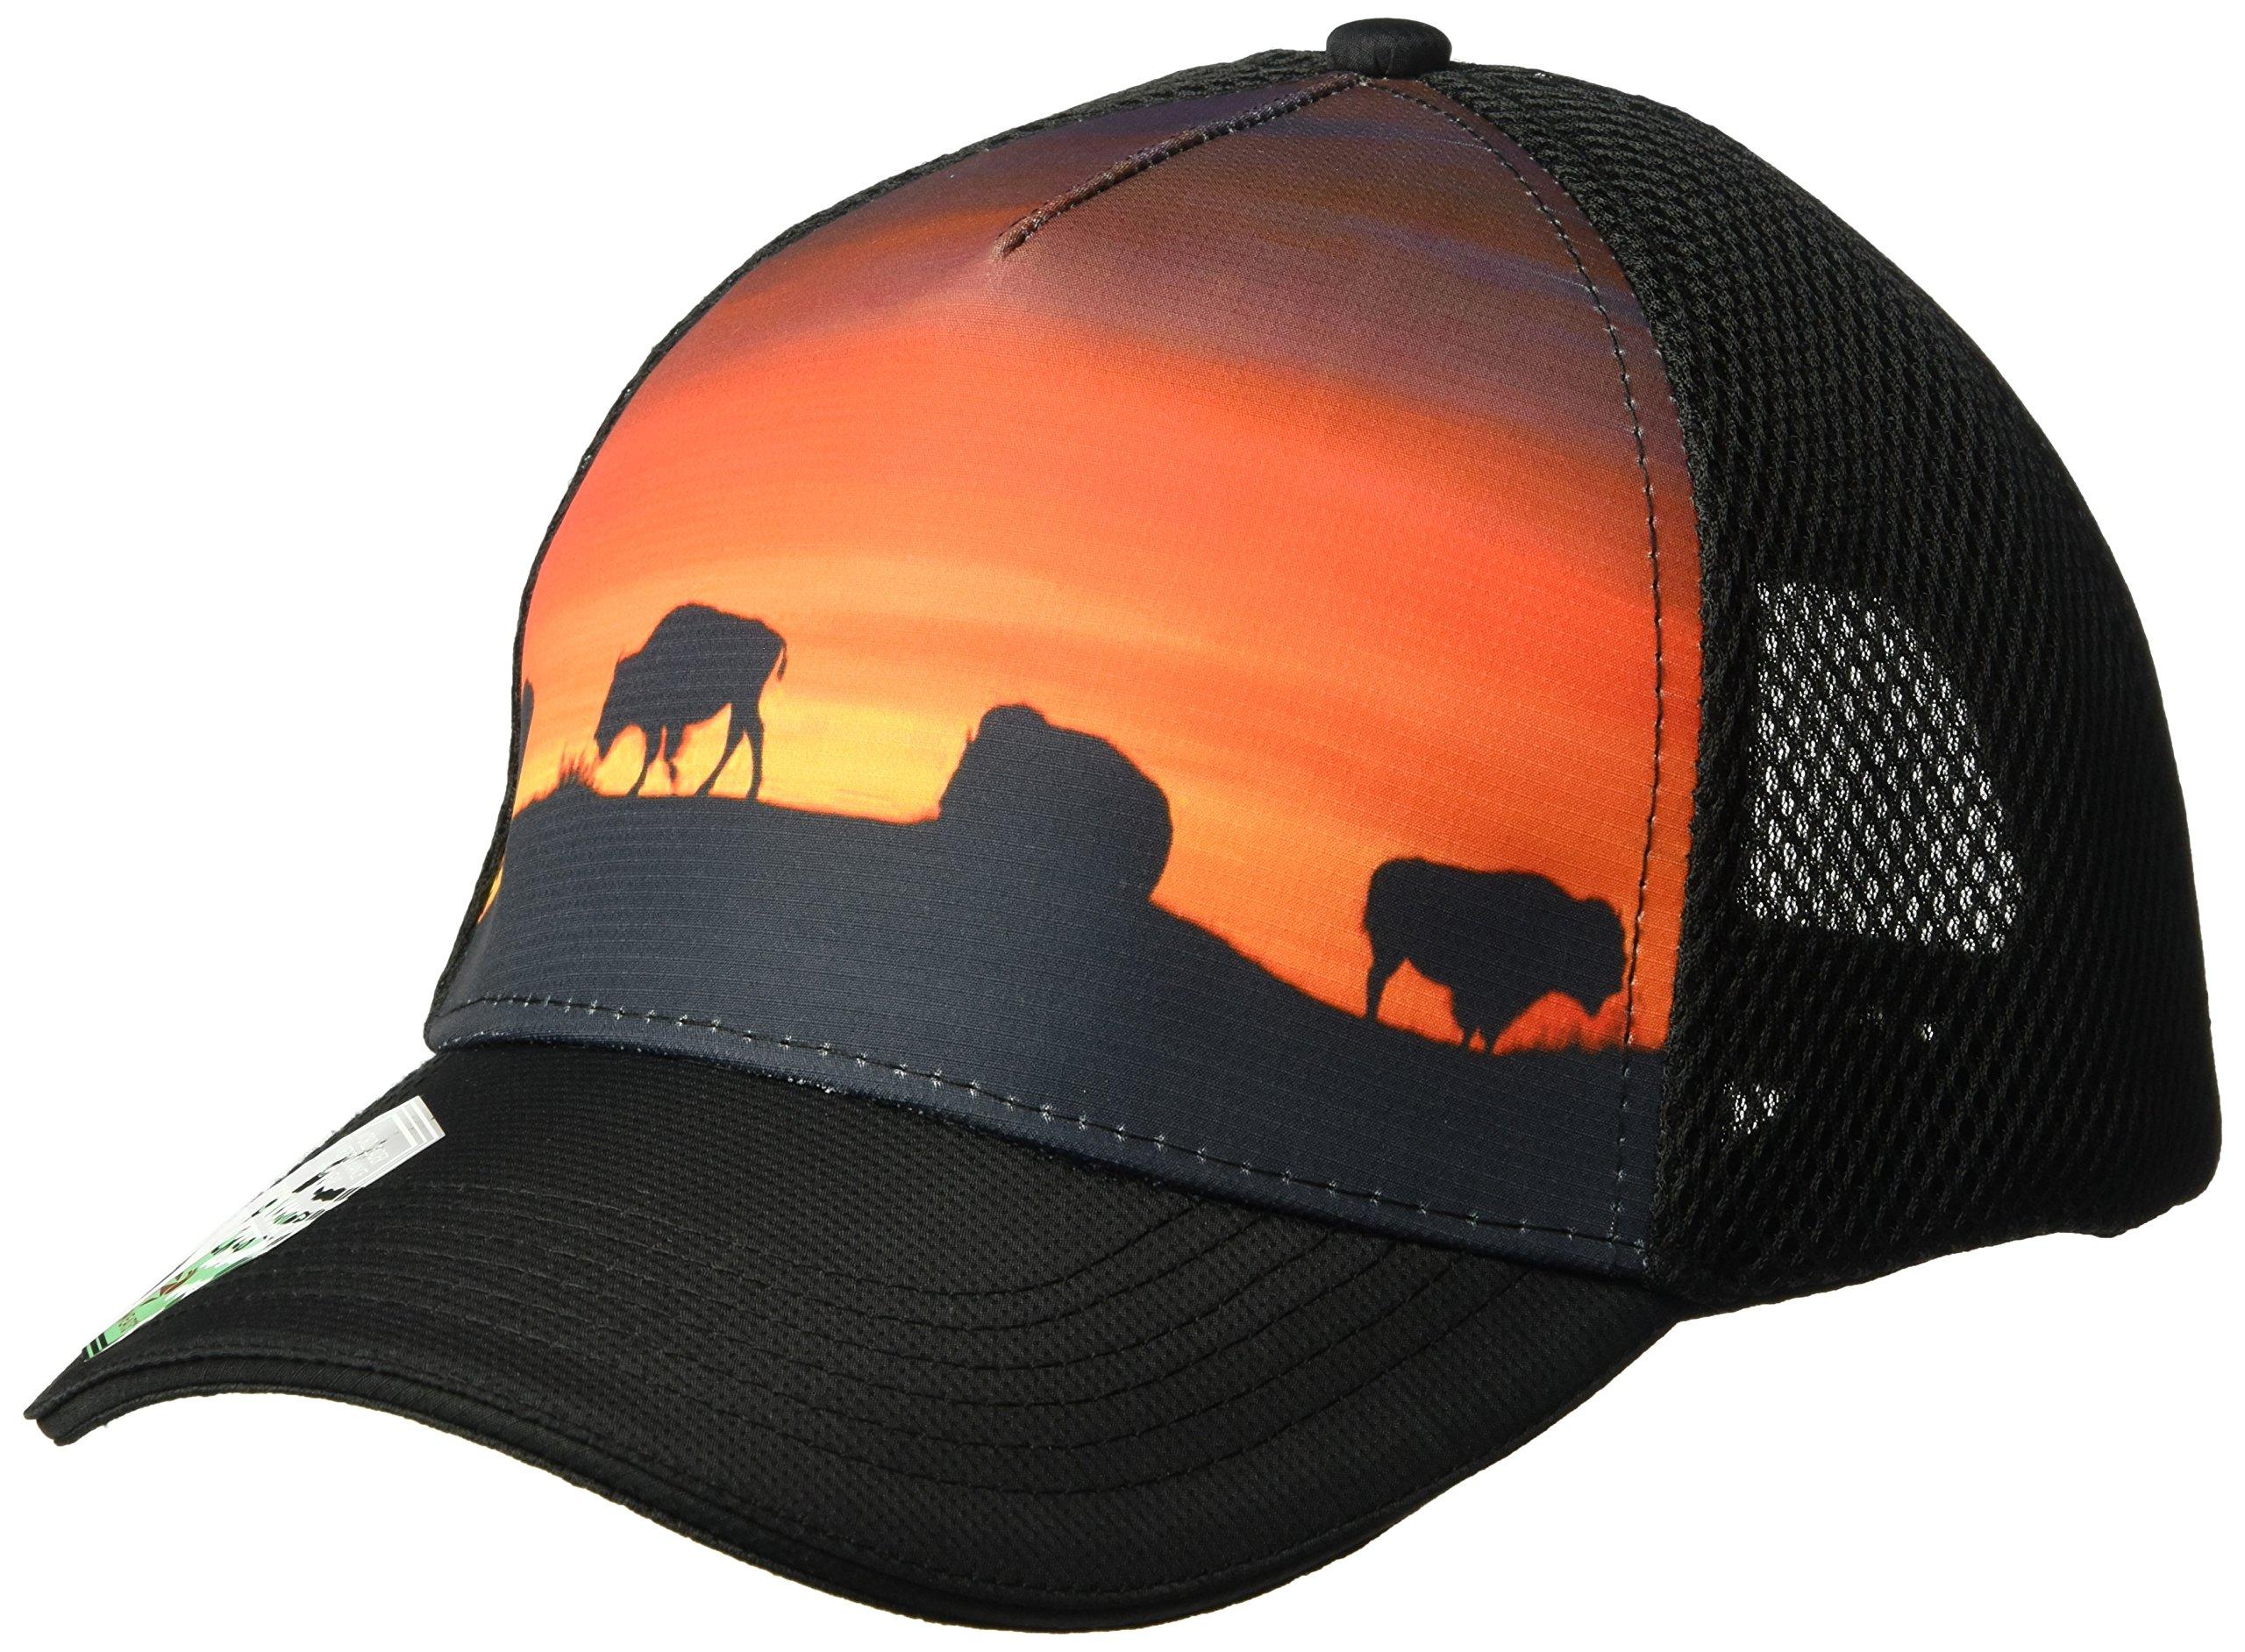 1ec1d5ba Headsweats 5 Panel Yellowstone Trucker Hat, One Size, Black